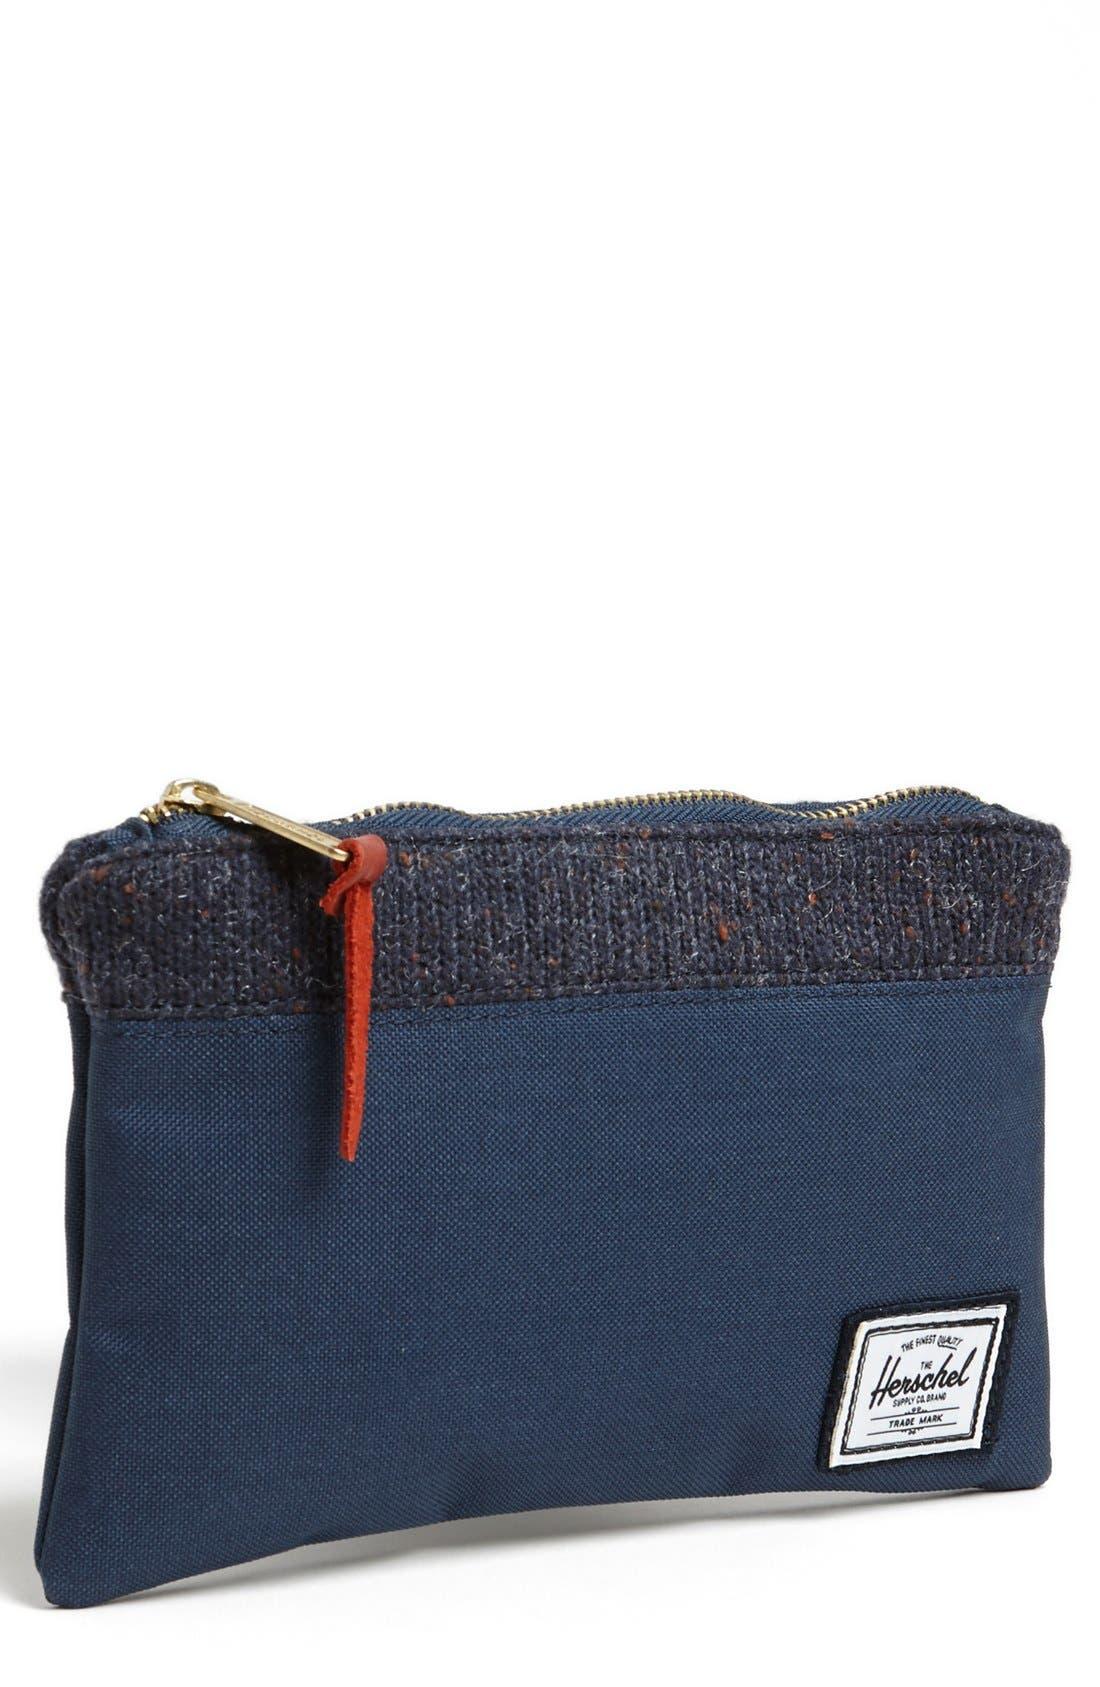 Main Image - Herschel Supply Co. Knit Trim Field Pouch